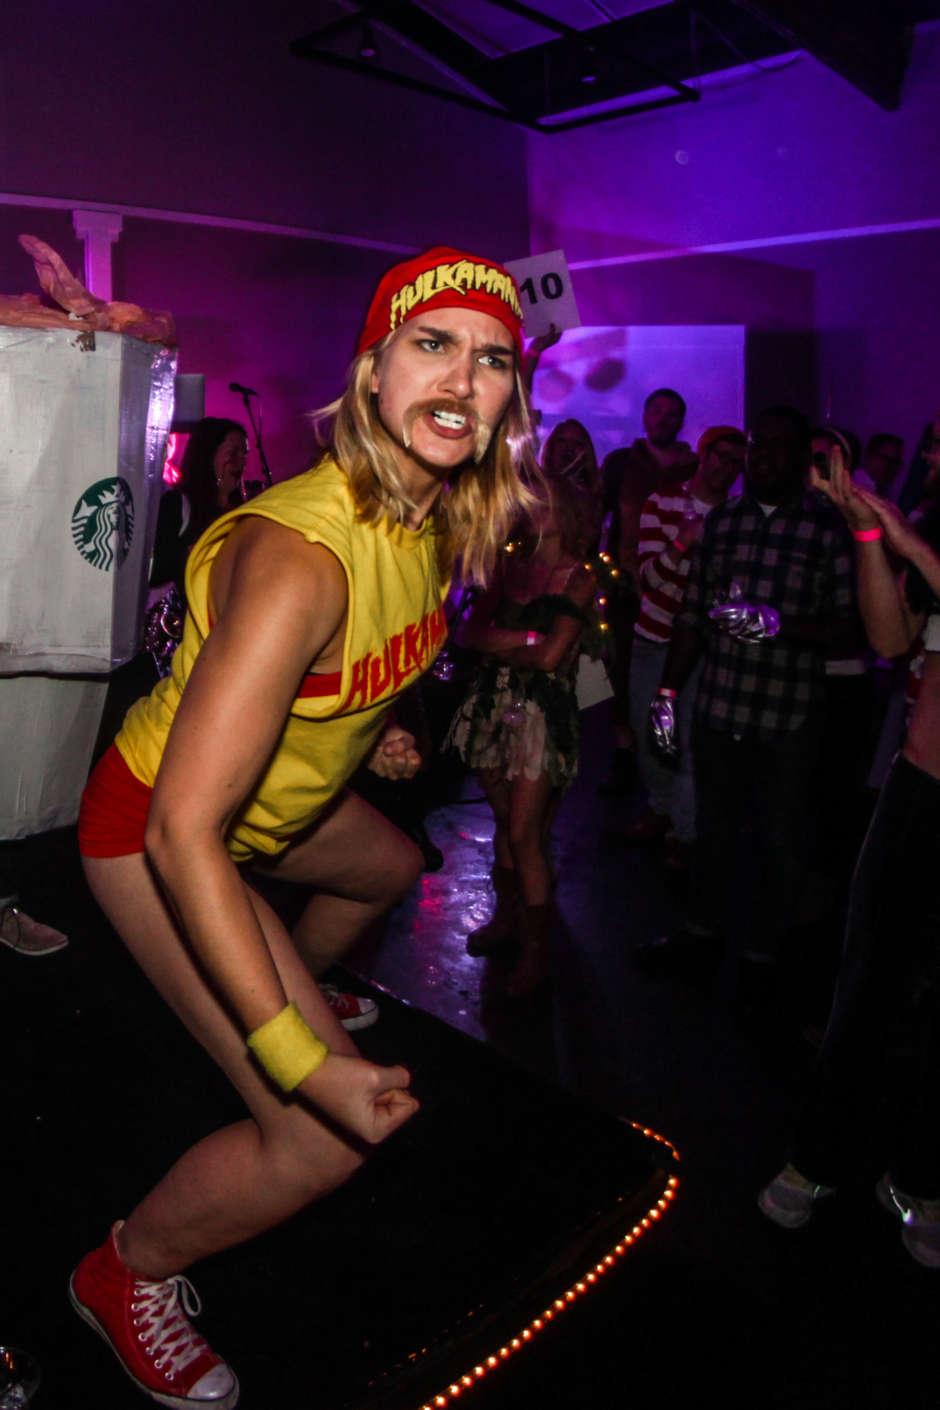 Hulkamania Woman Halloween Costume